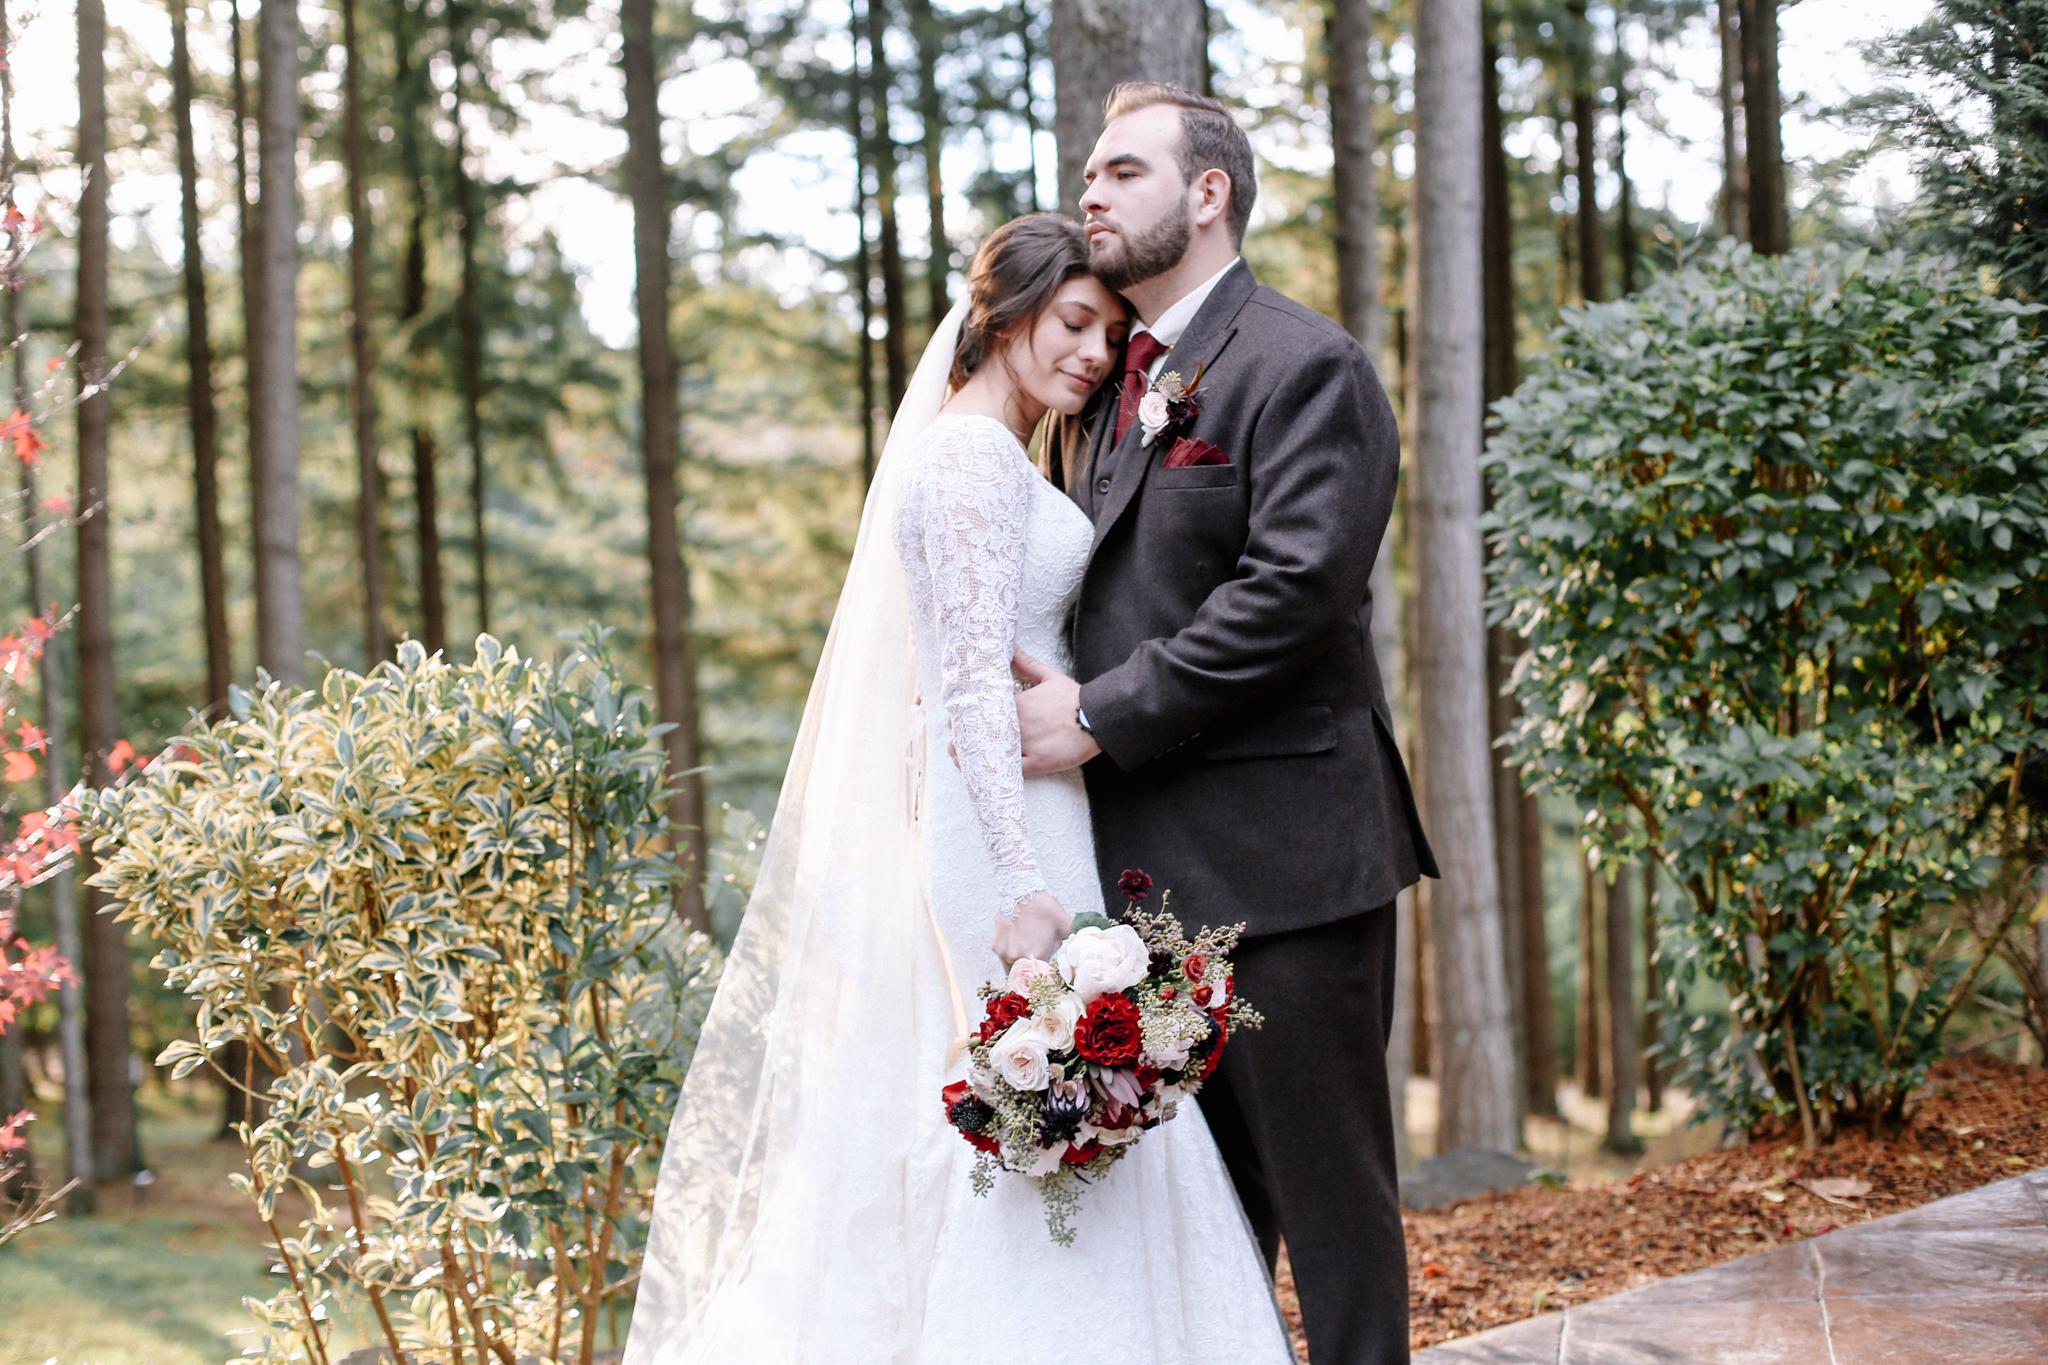 Manu and Laura - Portland Wedding Photographer - 25.jpg